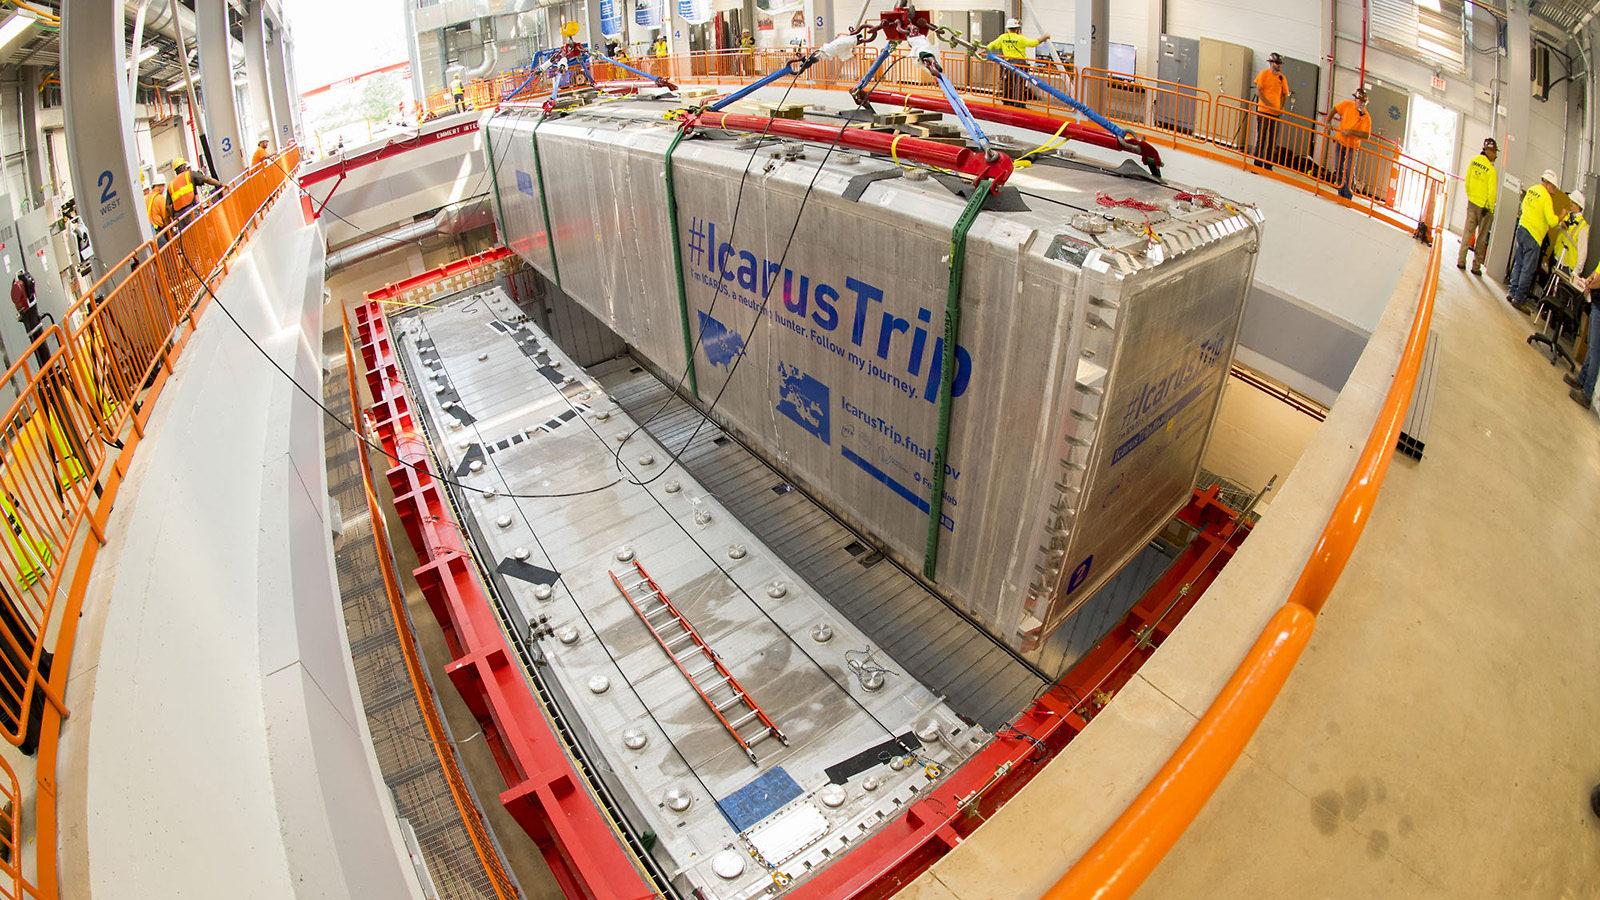 ICARUS neutrino detector installed at Fermilab | symmetry magazine